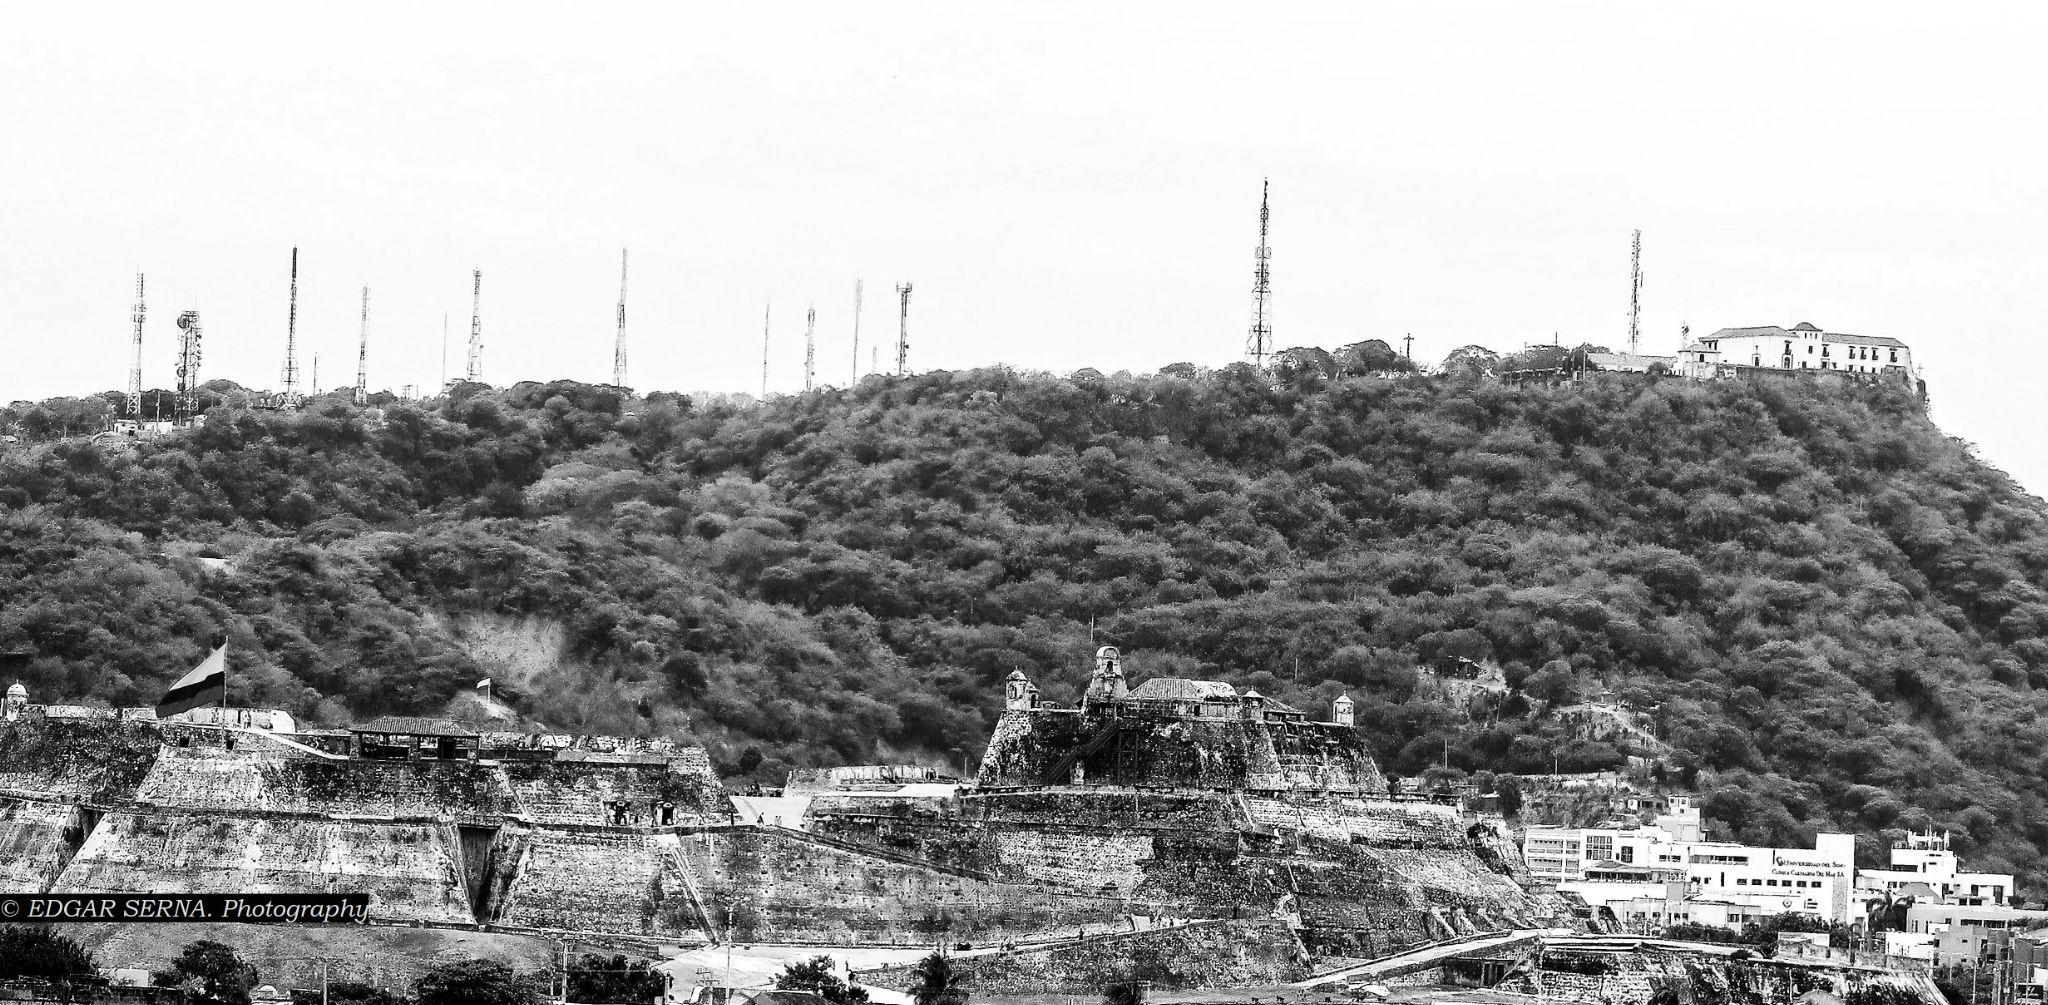 Cartagena Sep. 2014 by Edgar Serna